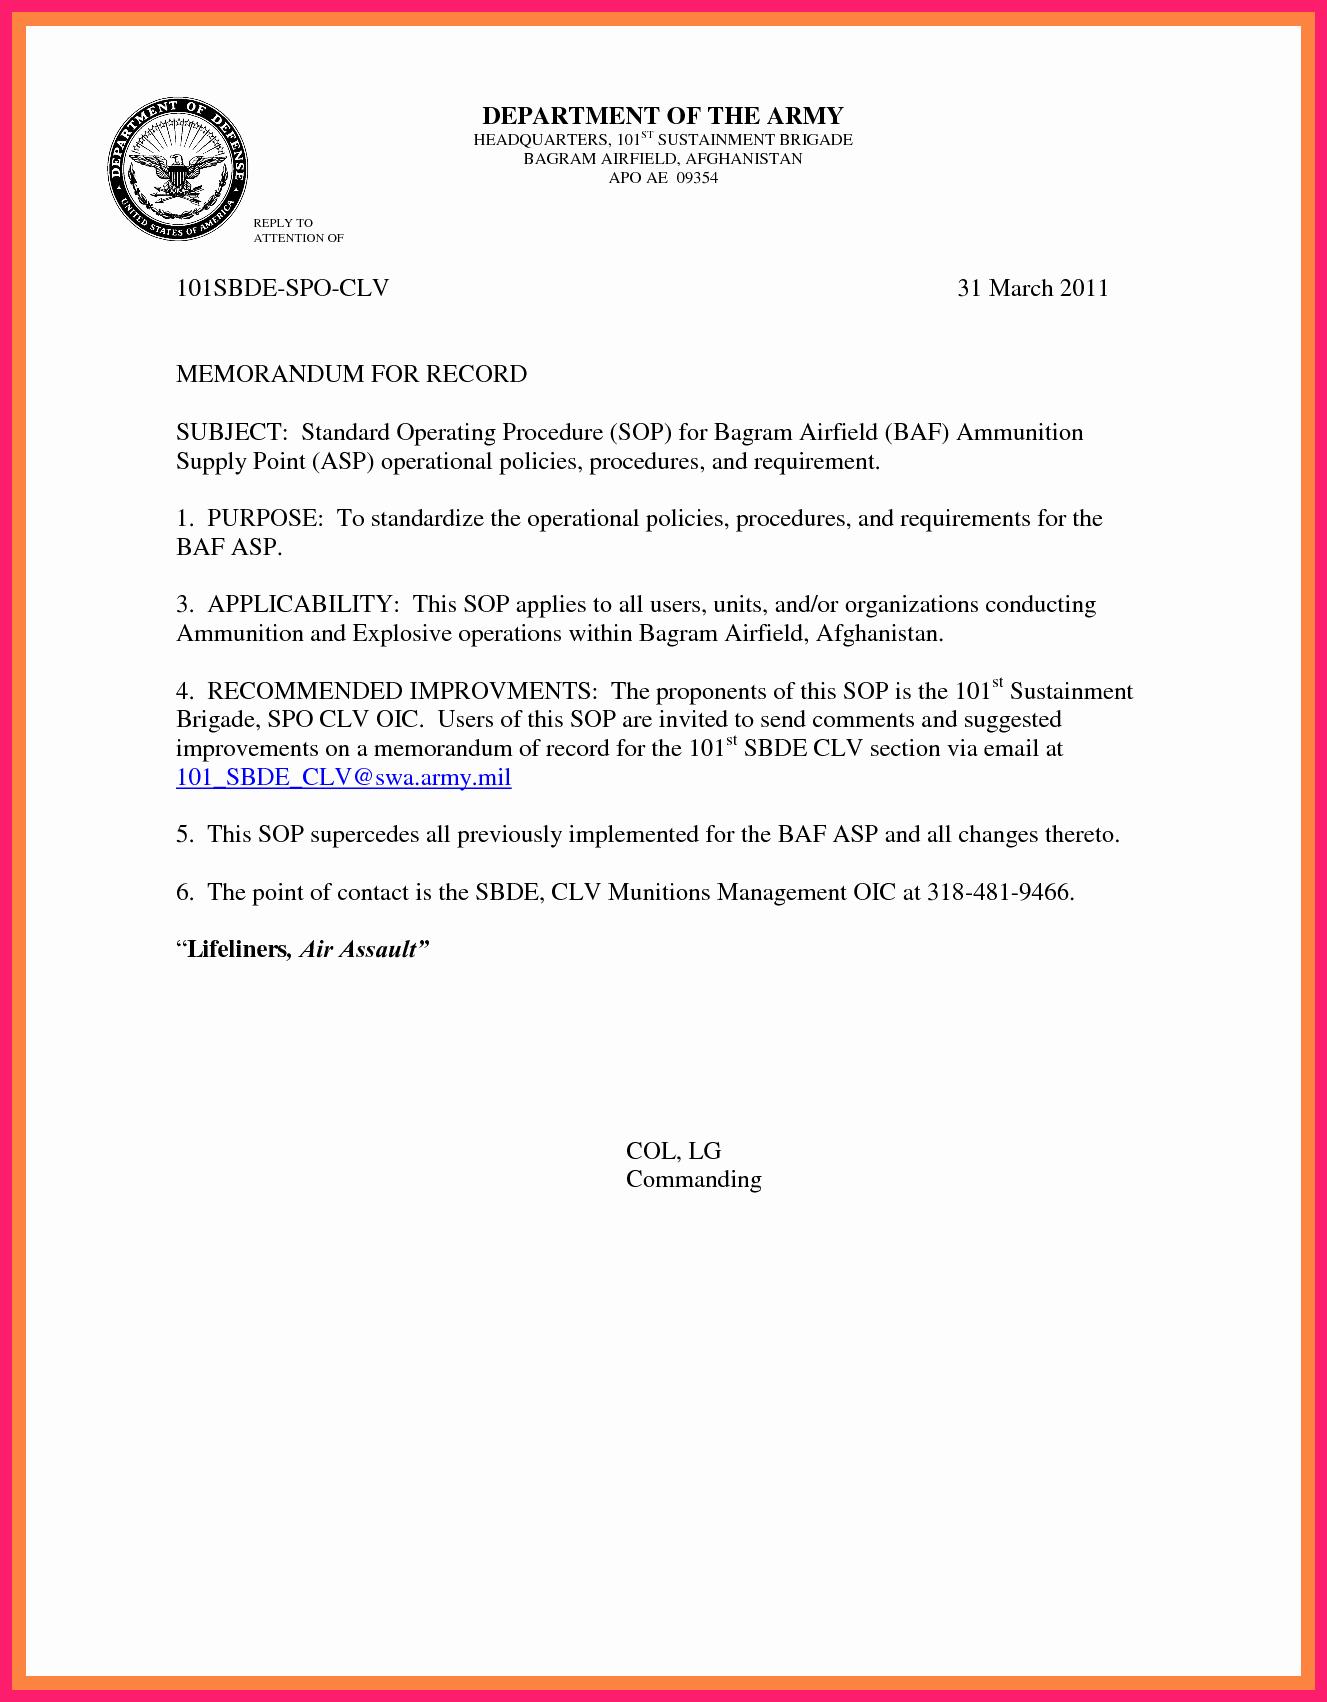 Army Memorandum for Record Template Beautiful Memorandum for Record Army